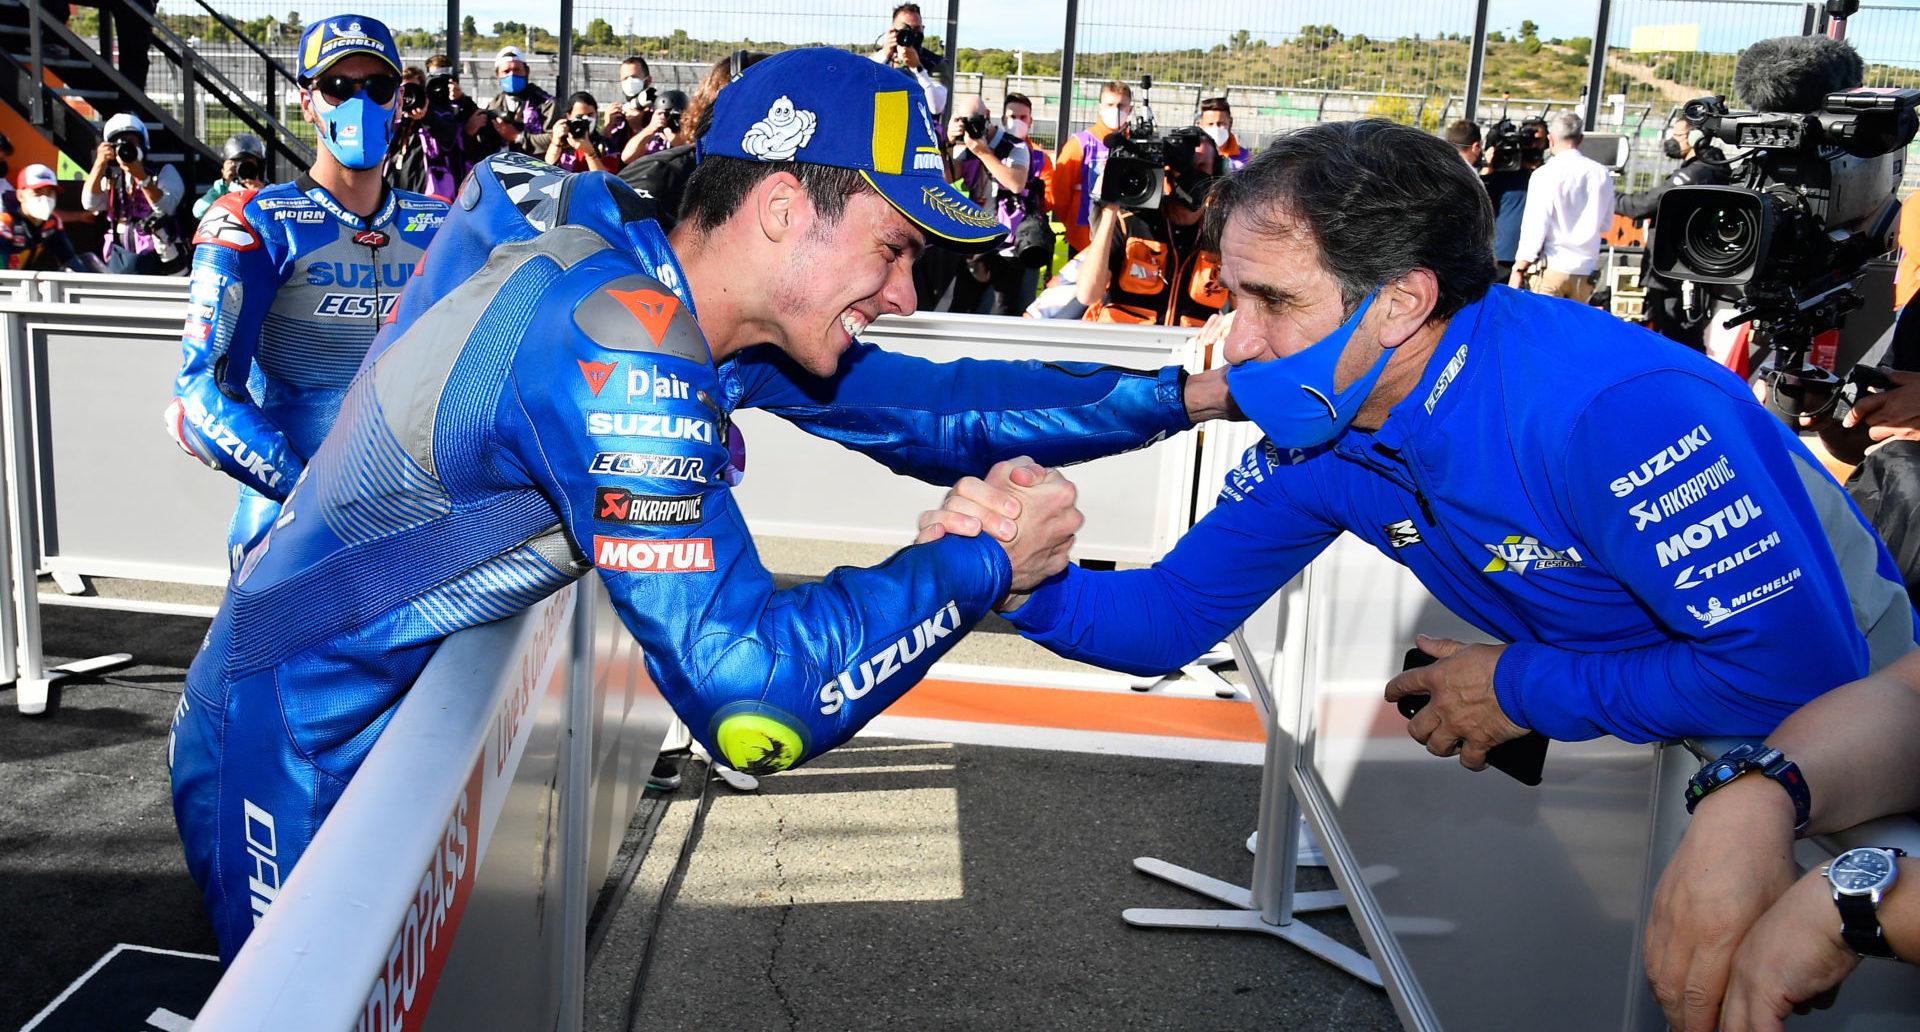 Davide Brivio (right) shakes hands with 2020 MotoGP World Champion Joan Mir (left). Mir's teammate Alex Rins looks on in the background. Photo courtesy Team Suzuki Press Office.